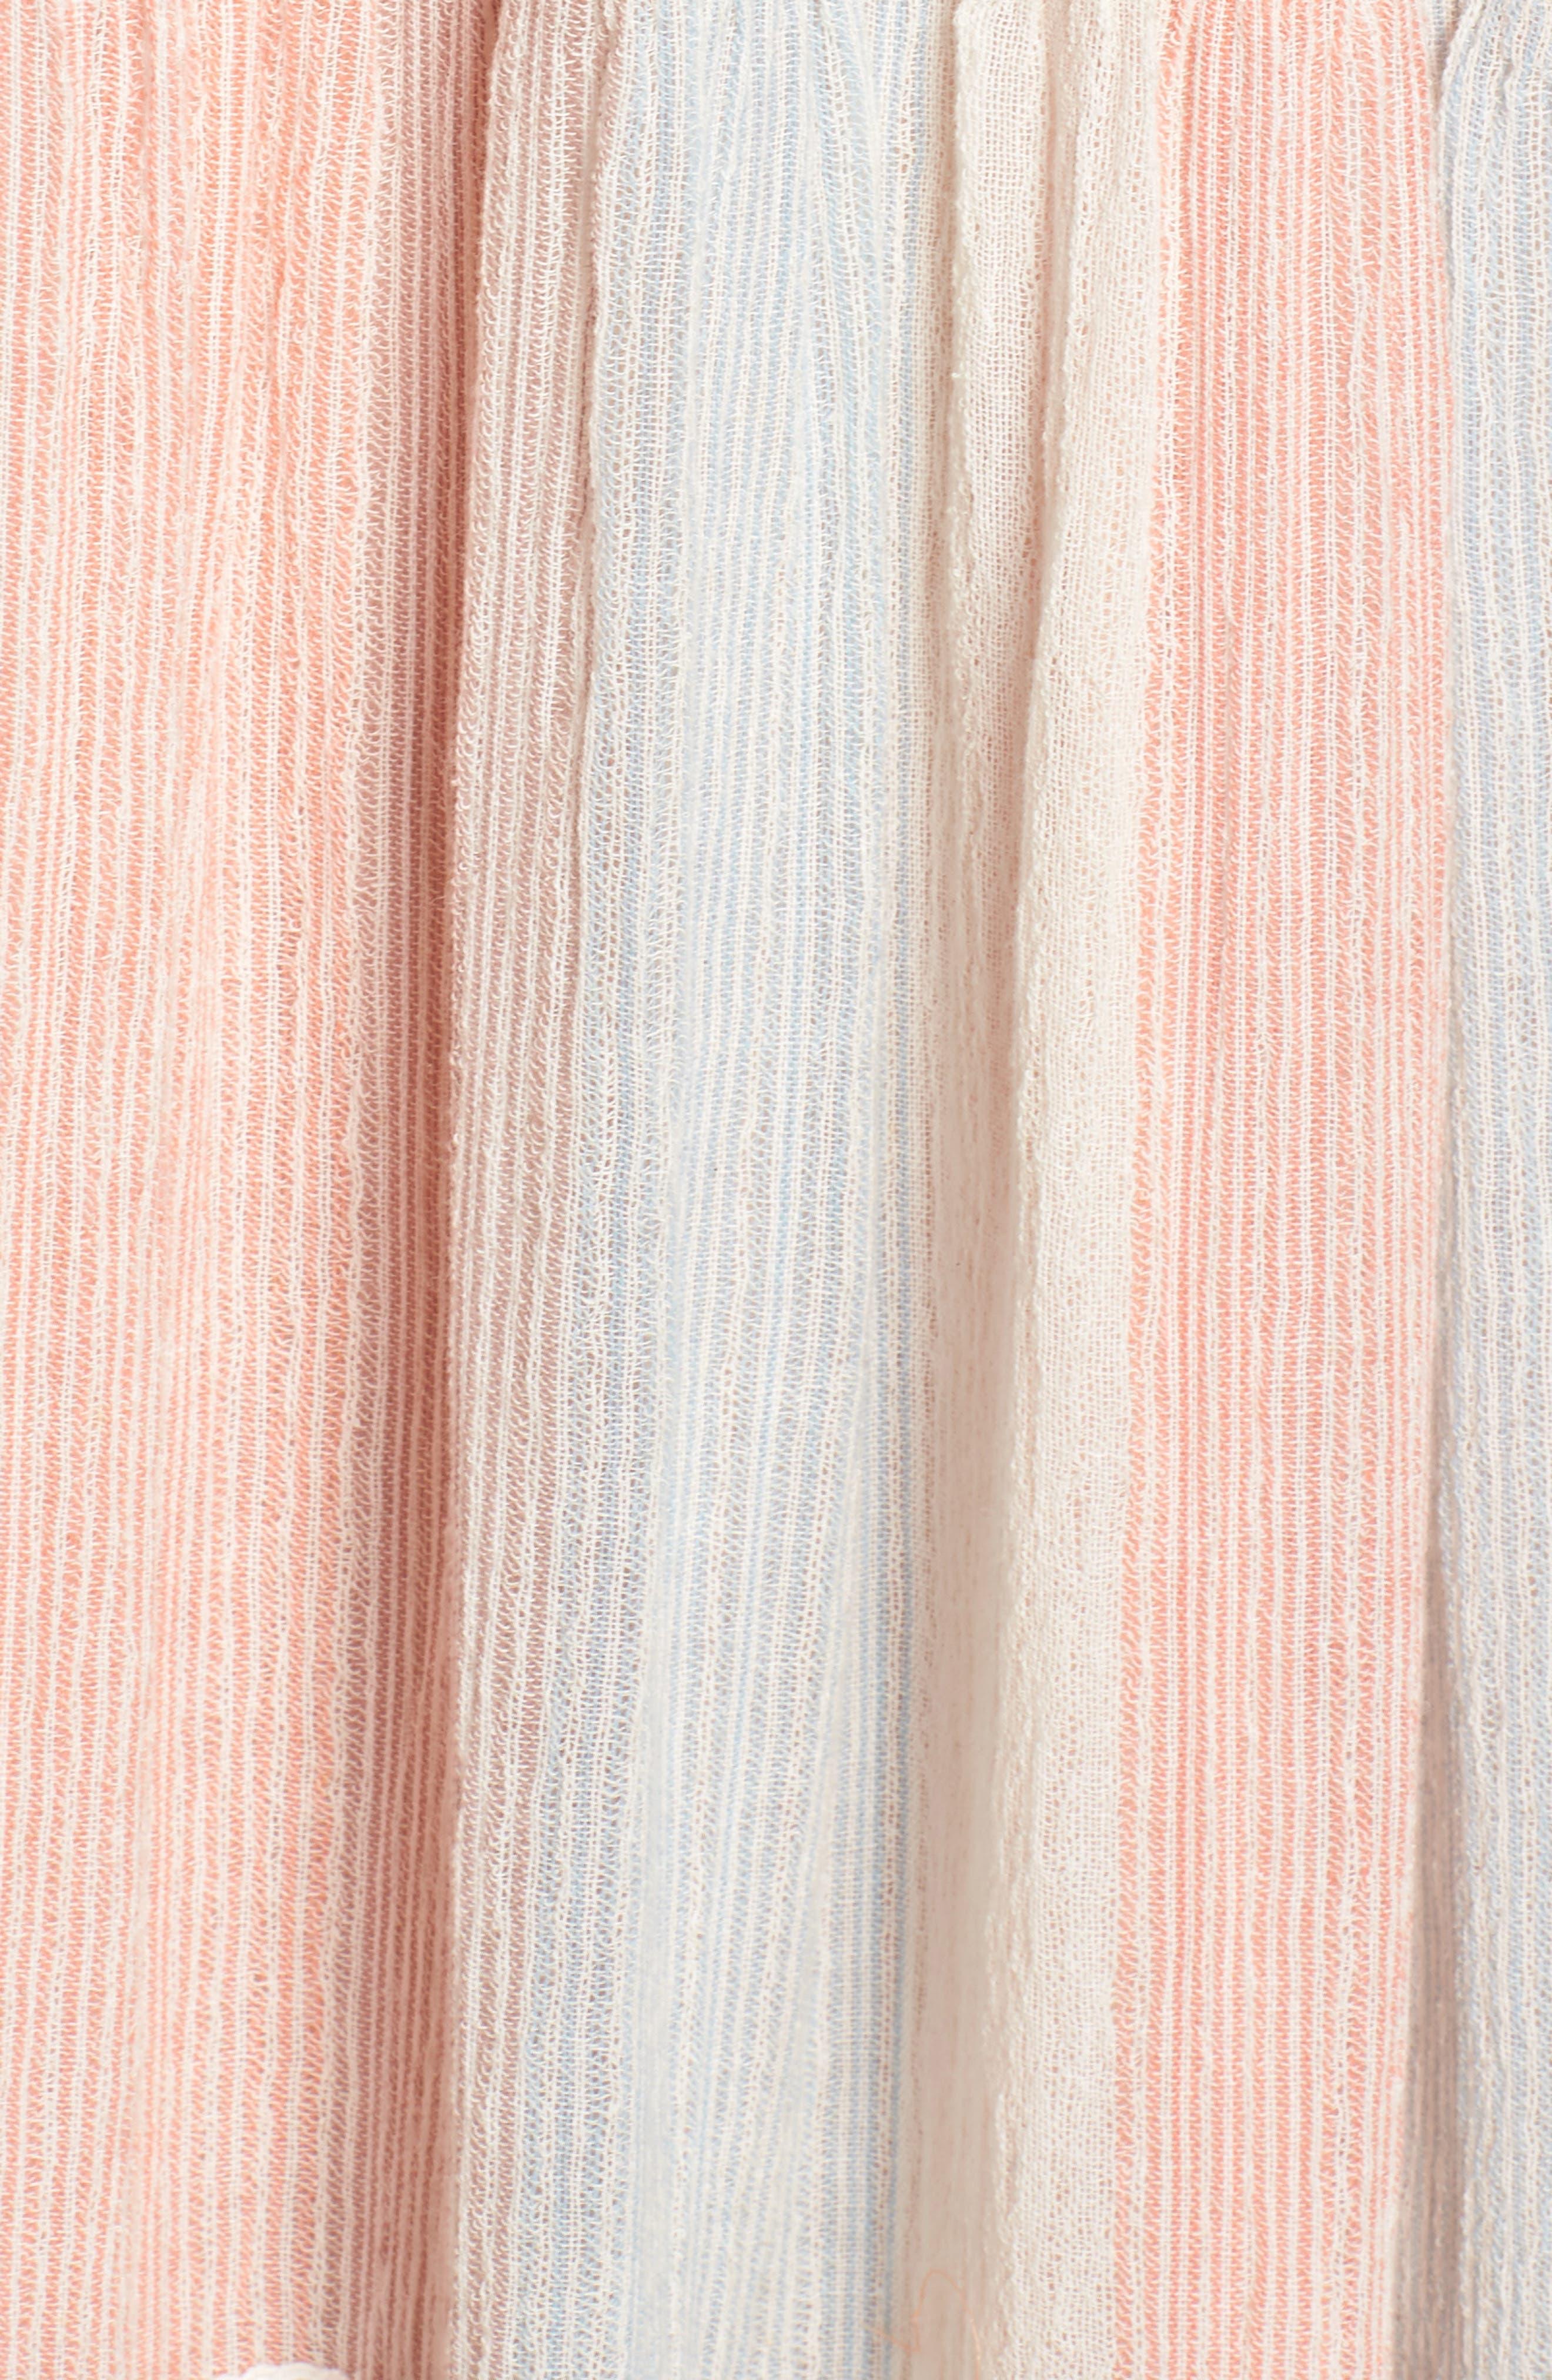 Hemant & Nandita Cover-Up Maxi Dress,                             Alternate thumbnail 5, color,                             650